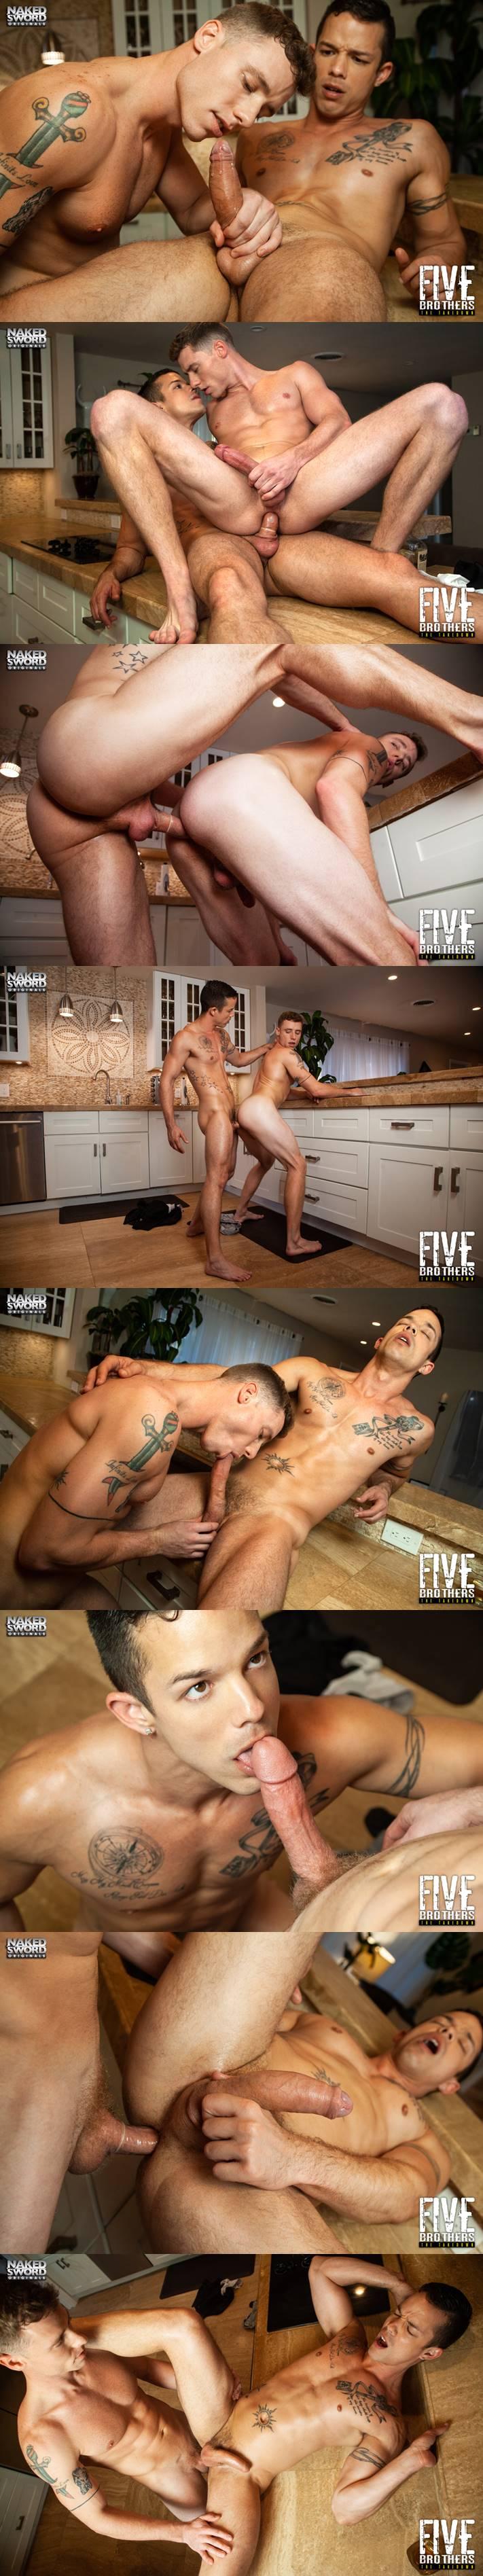 Five Brothers: The Takedown - Nic Sahara & Justin Matthews